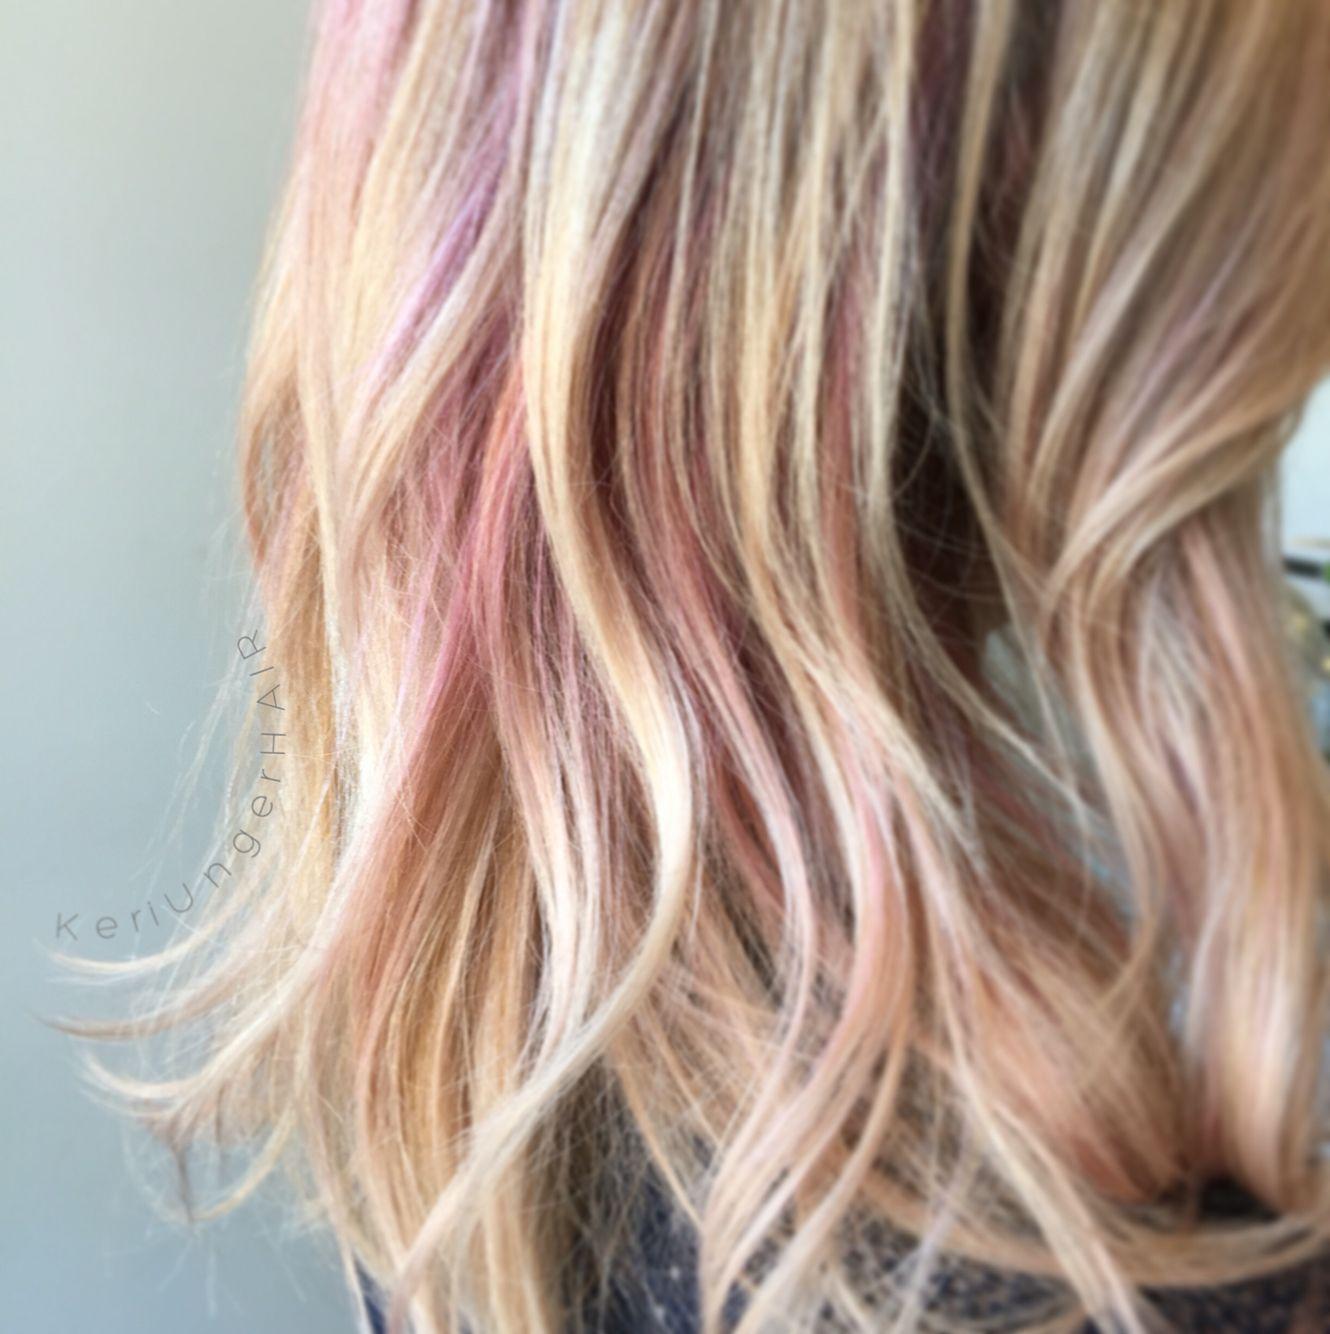 Soft Subtle Hidden Pink In Blonde Haircolor Keriungerhair Cleveland Lob Pink Blonde Hair Pink Hair Streaks Pink Underneath Hair